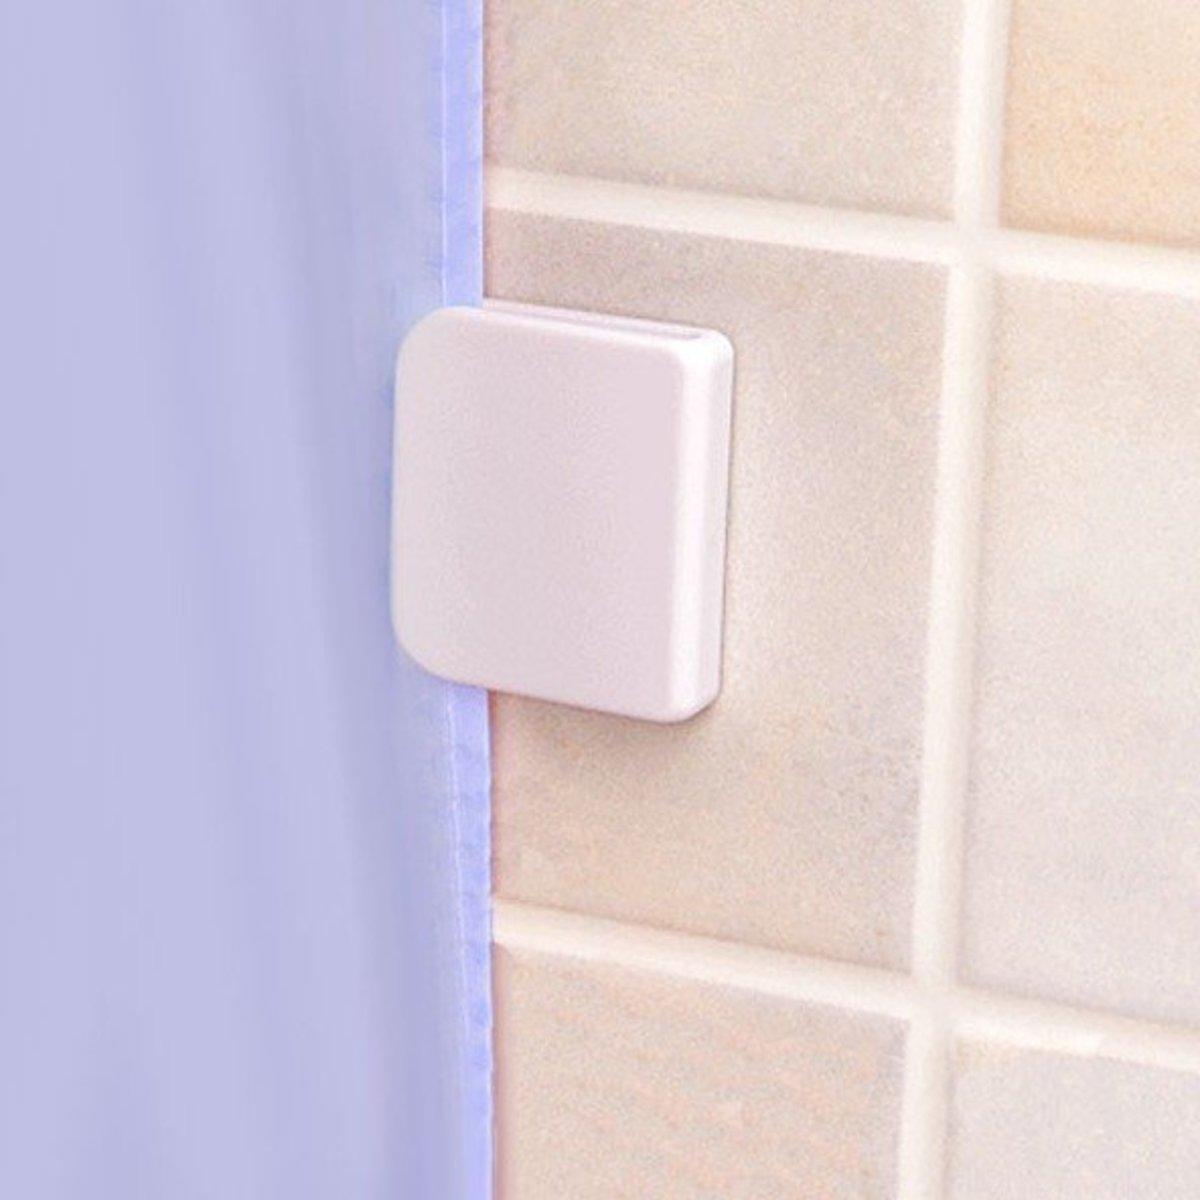 2 pcs Adhesive ShowerCurtain/Window Curtain Securing Clip